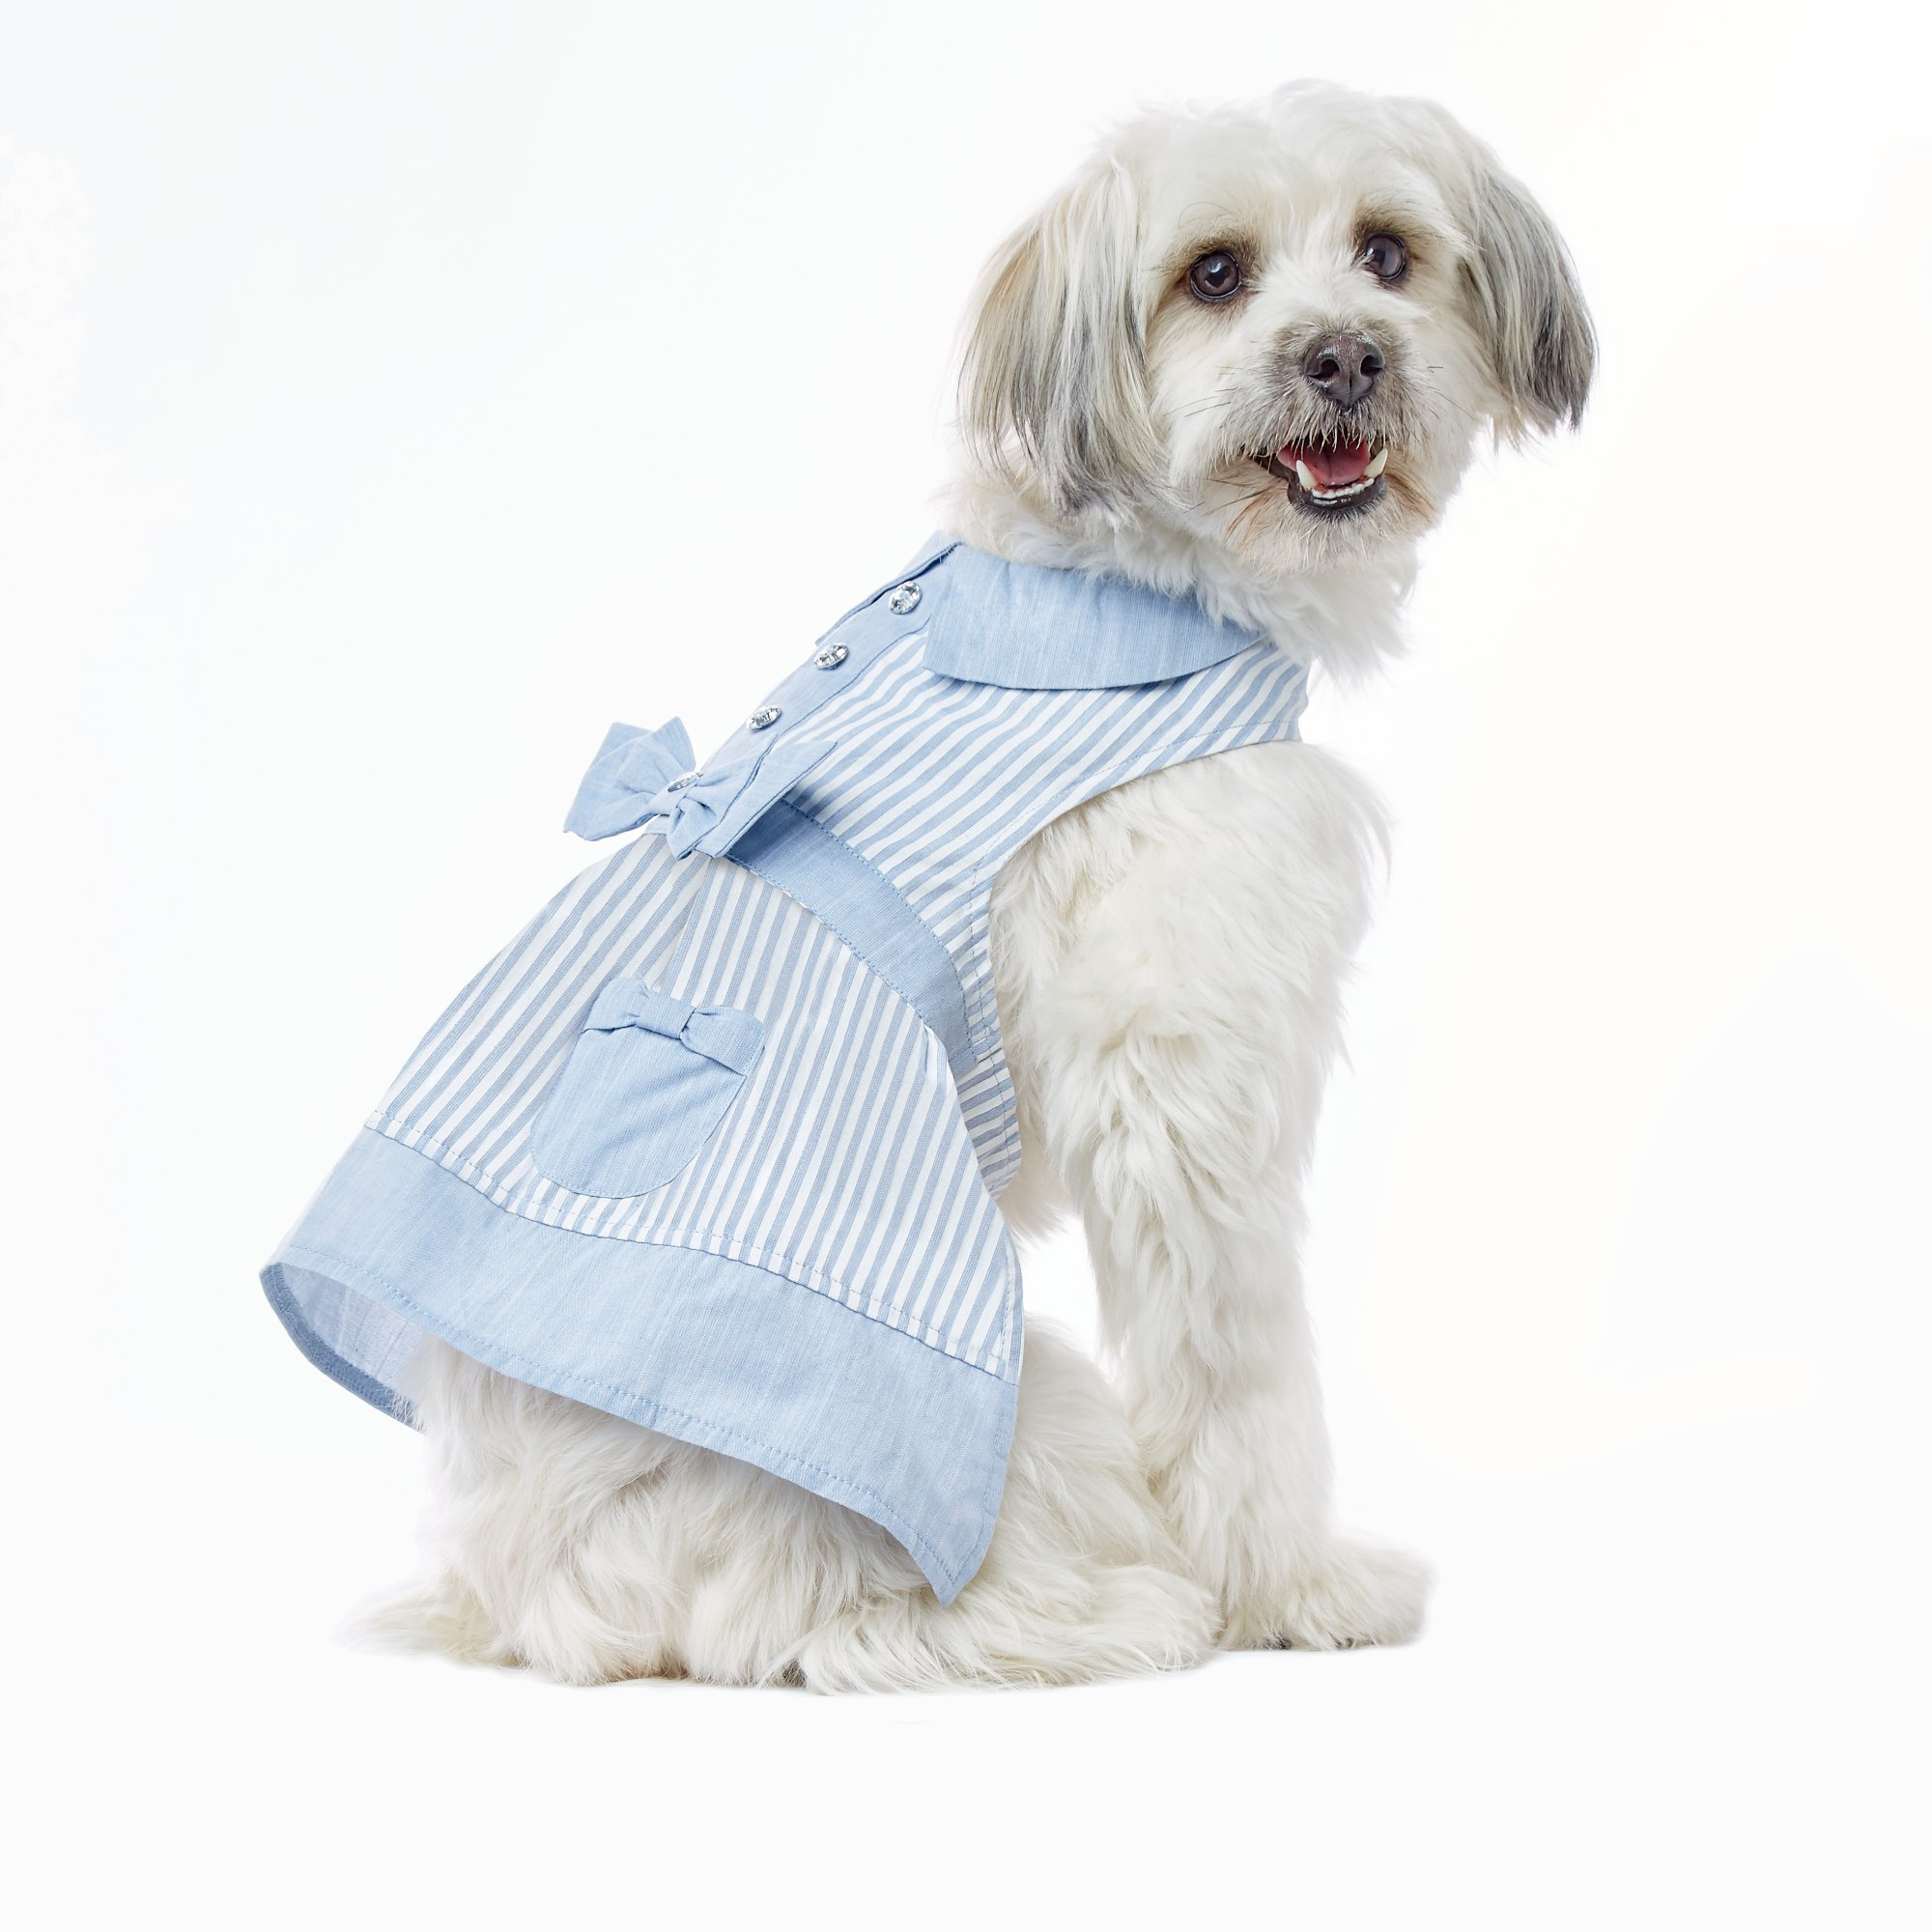 Smoochie Pooch Chambray Striped Pocket Apron Dress